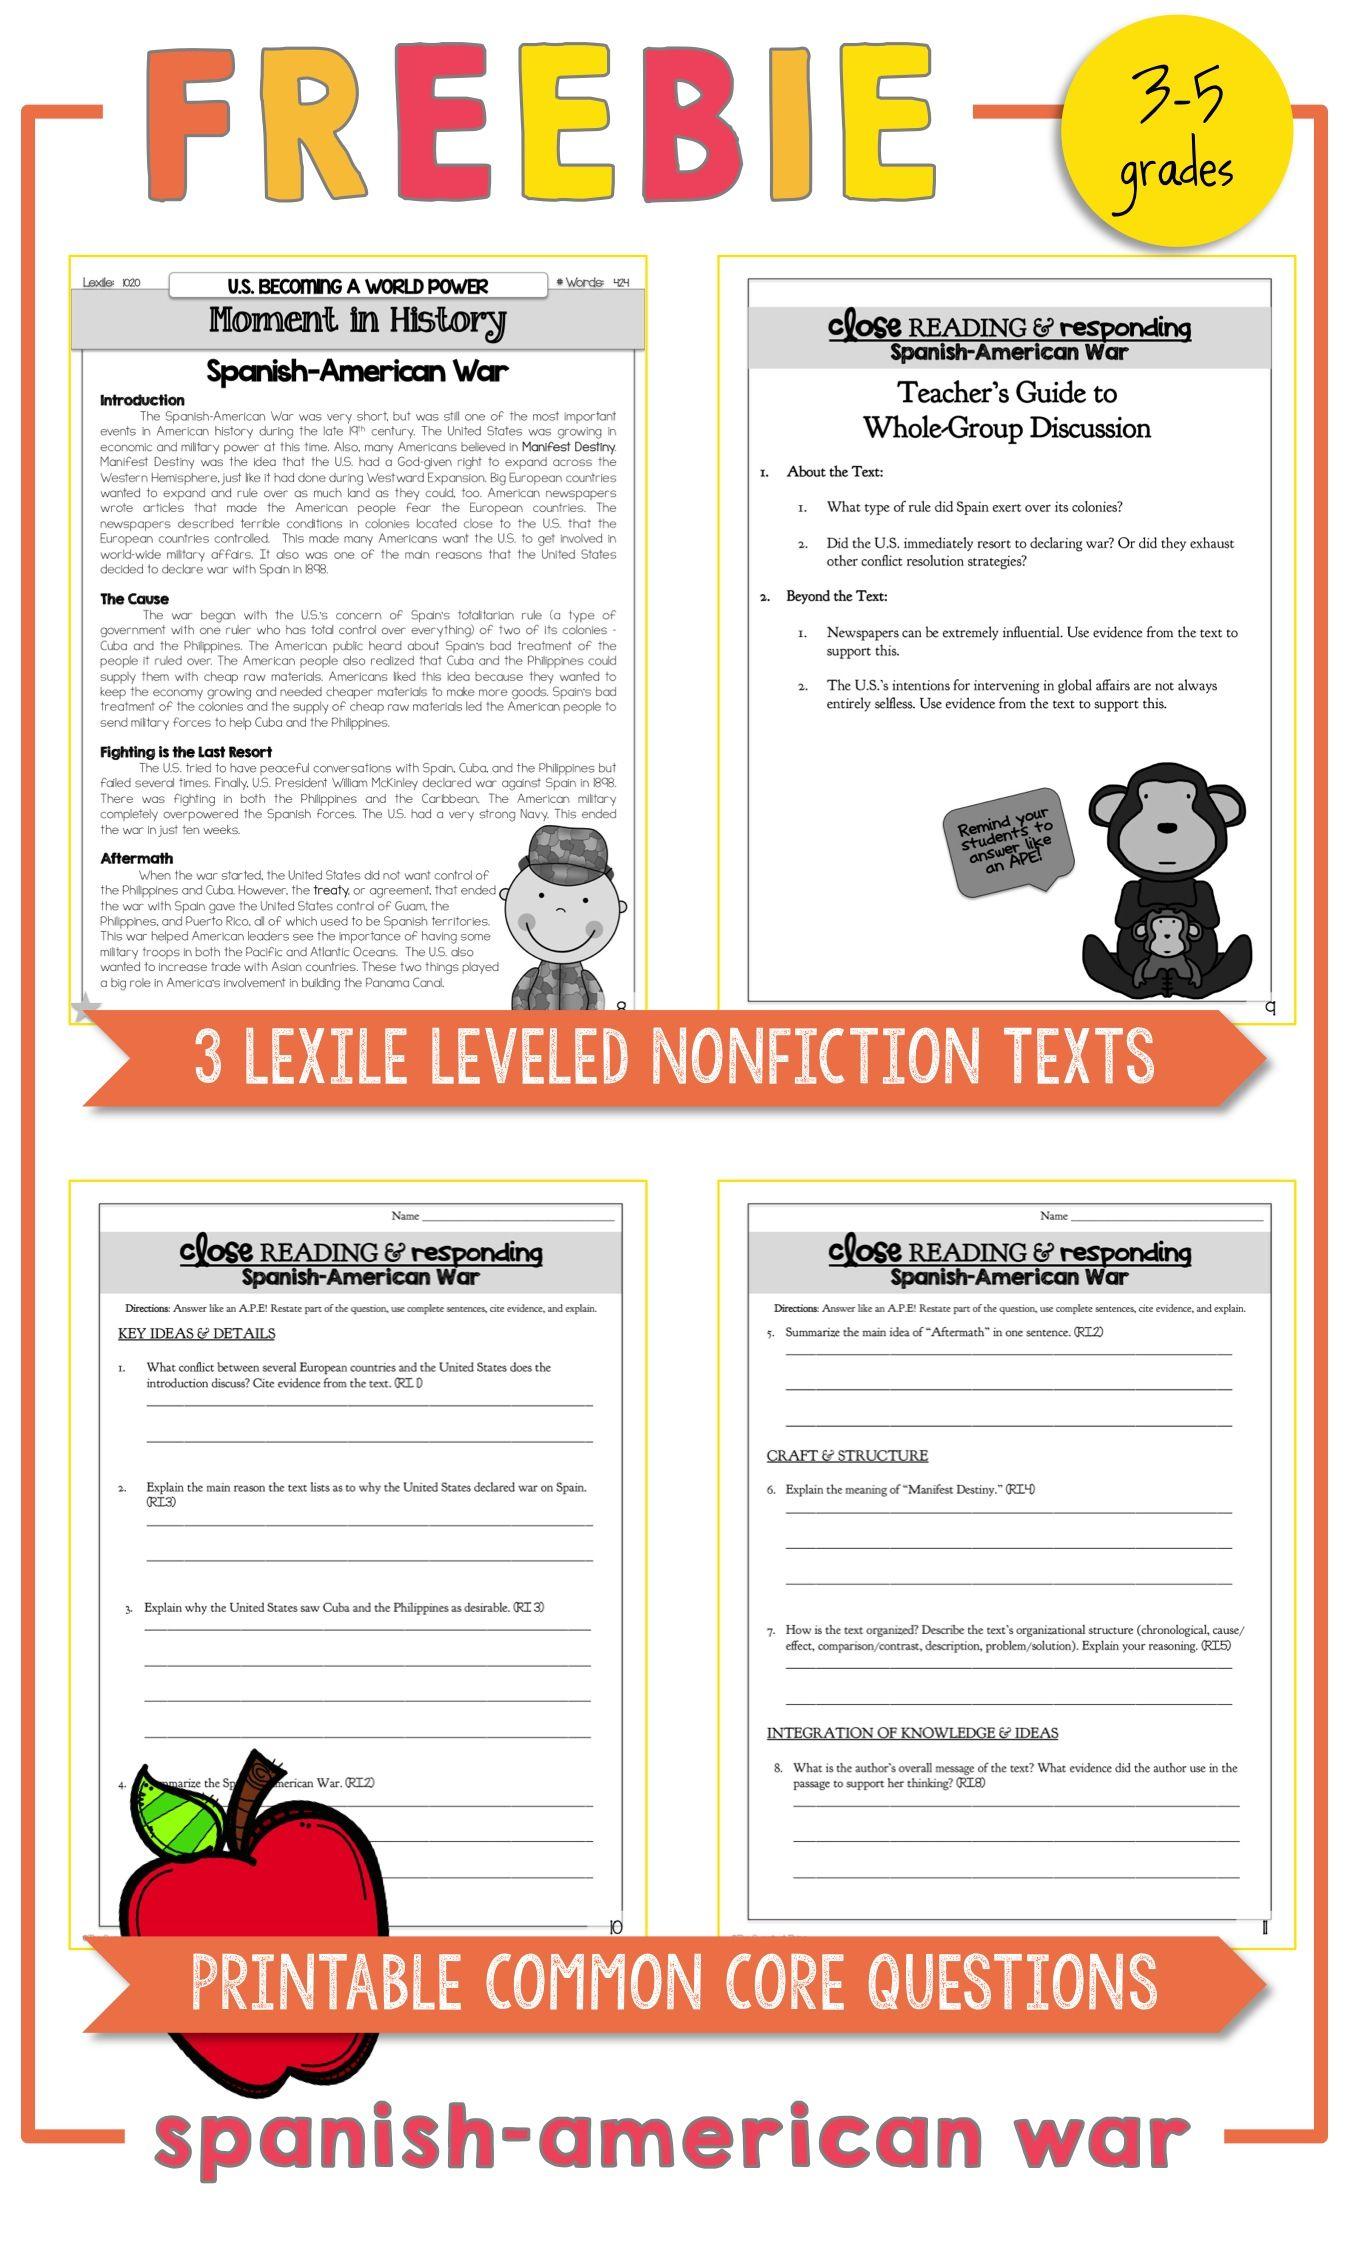 worksheet Spanish American War Worksheet free spanish american war lexile leveled nonfiction texts printable common core questions